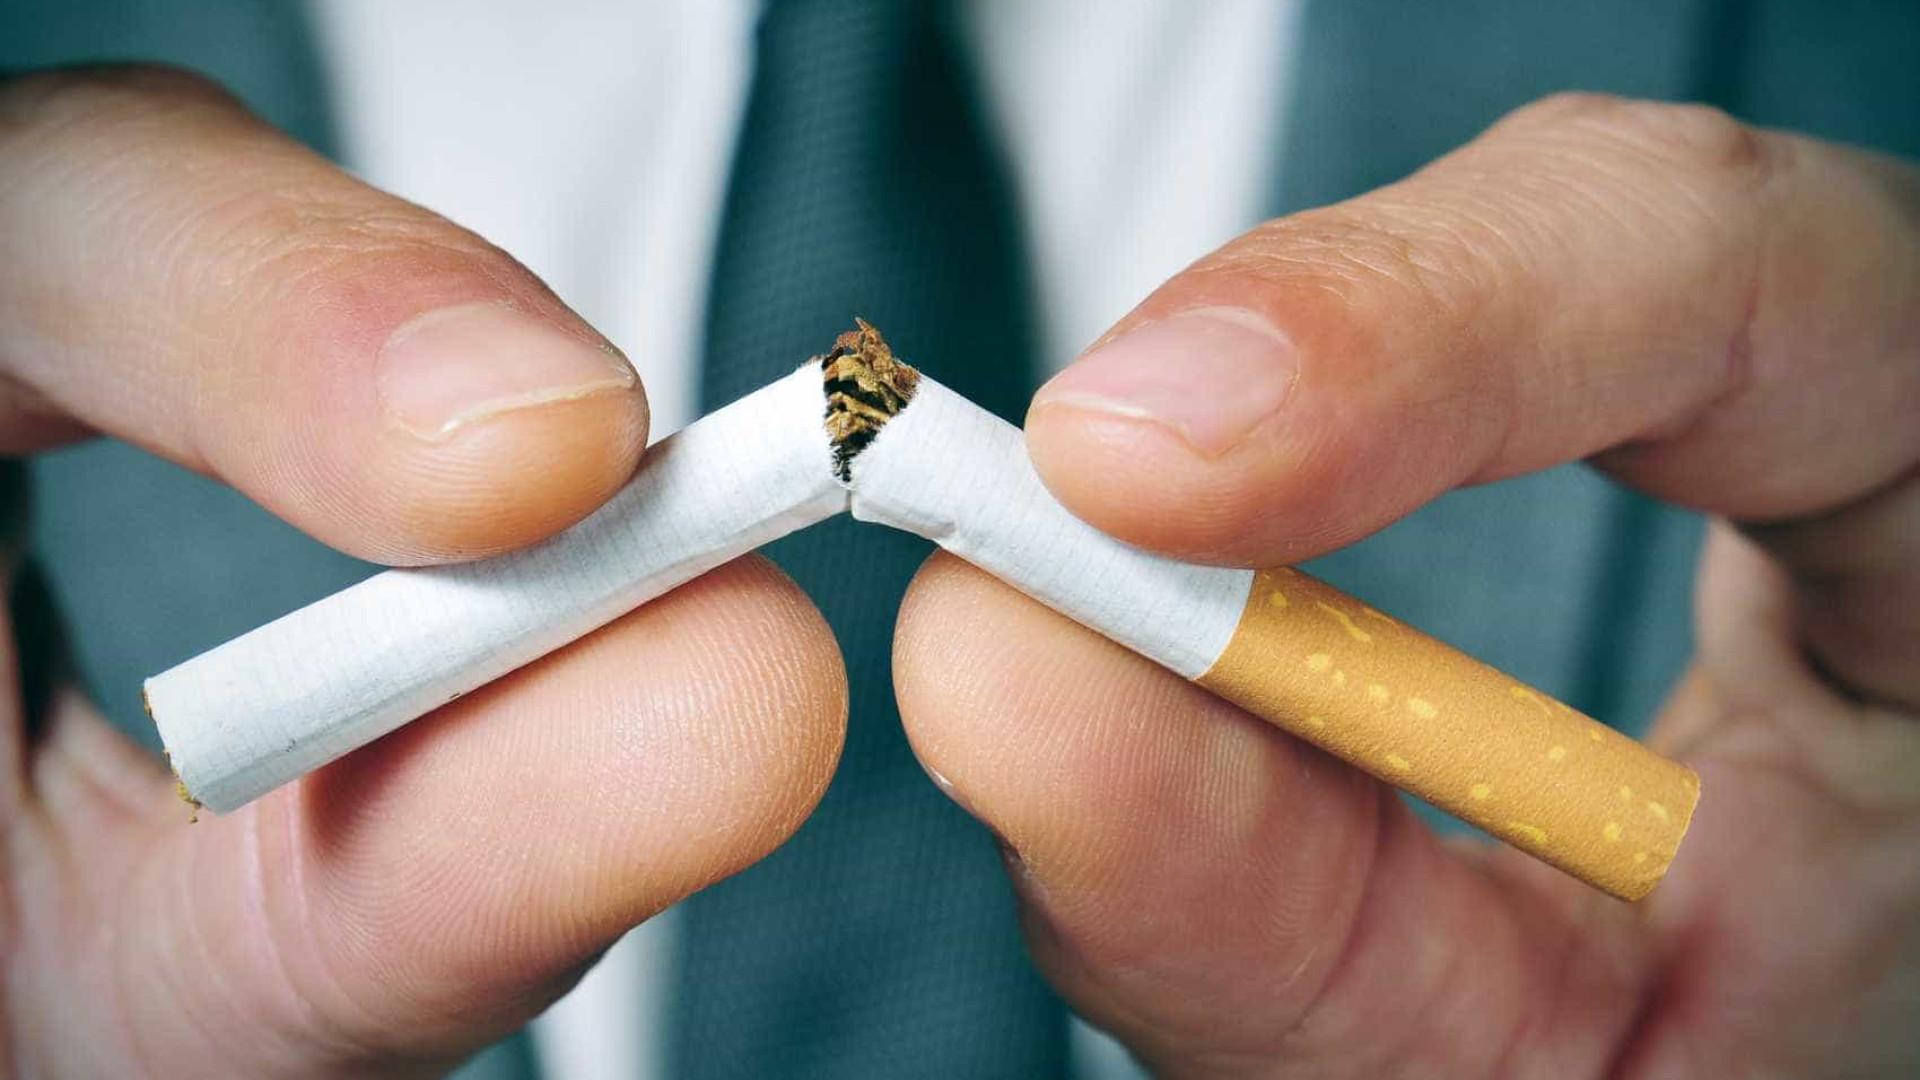 Eis por que nunca é tarde para deixar de fumar